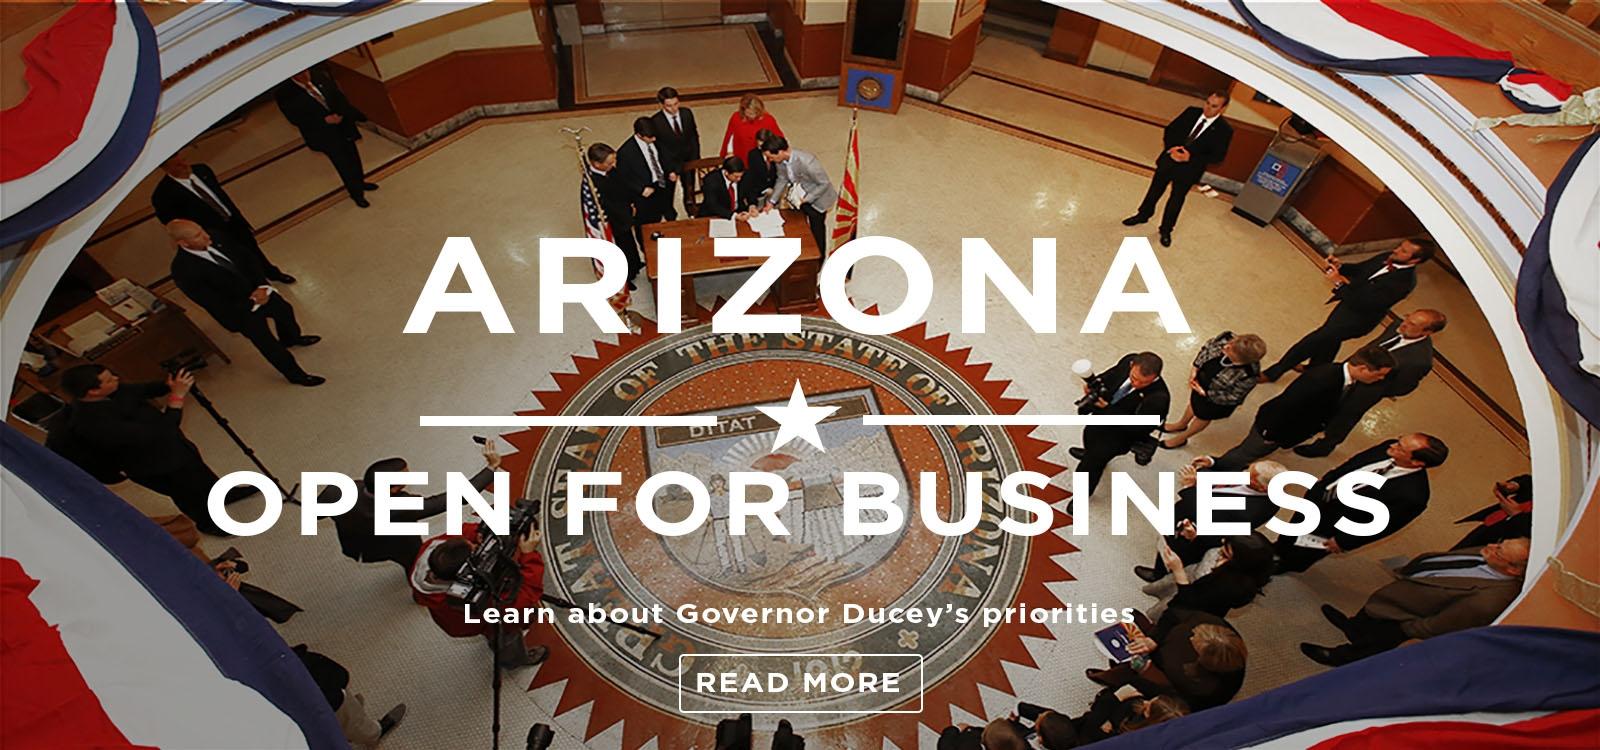 Arizona Open For Business